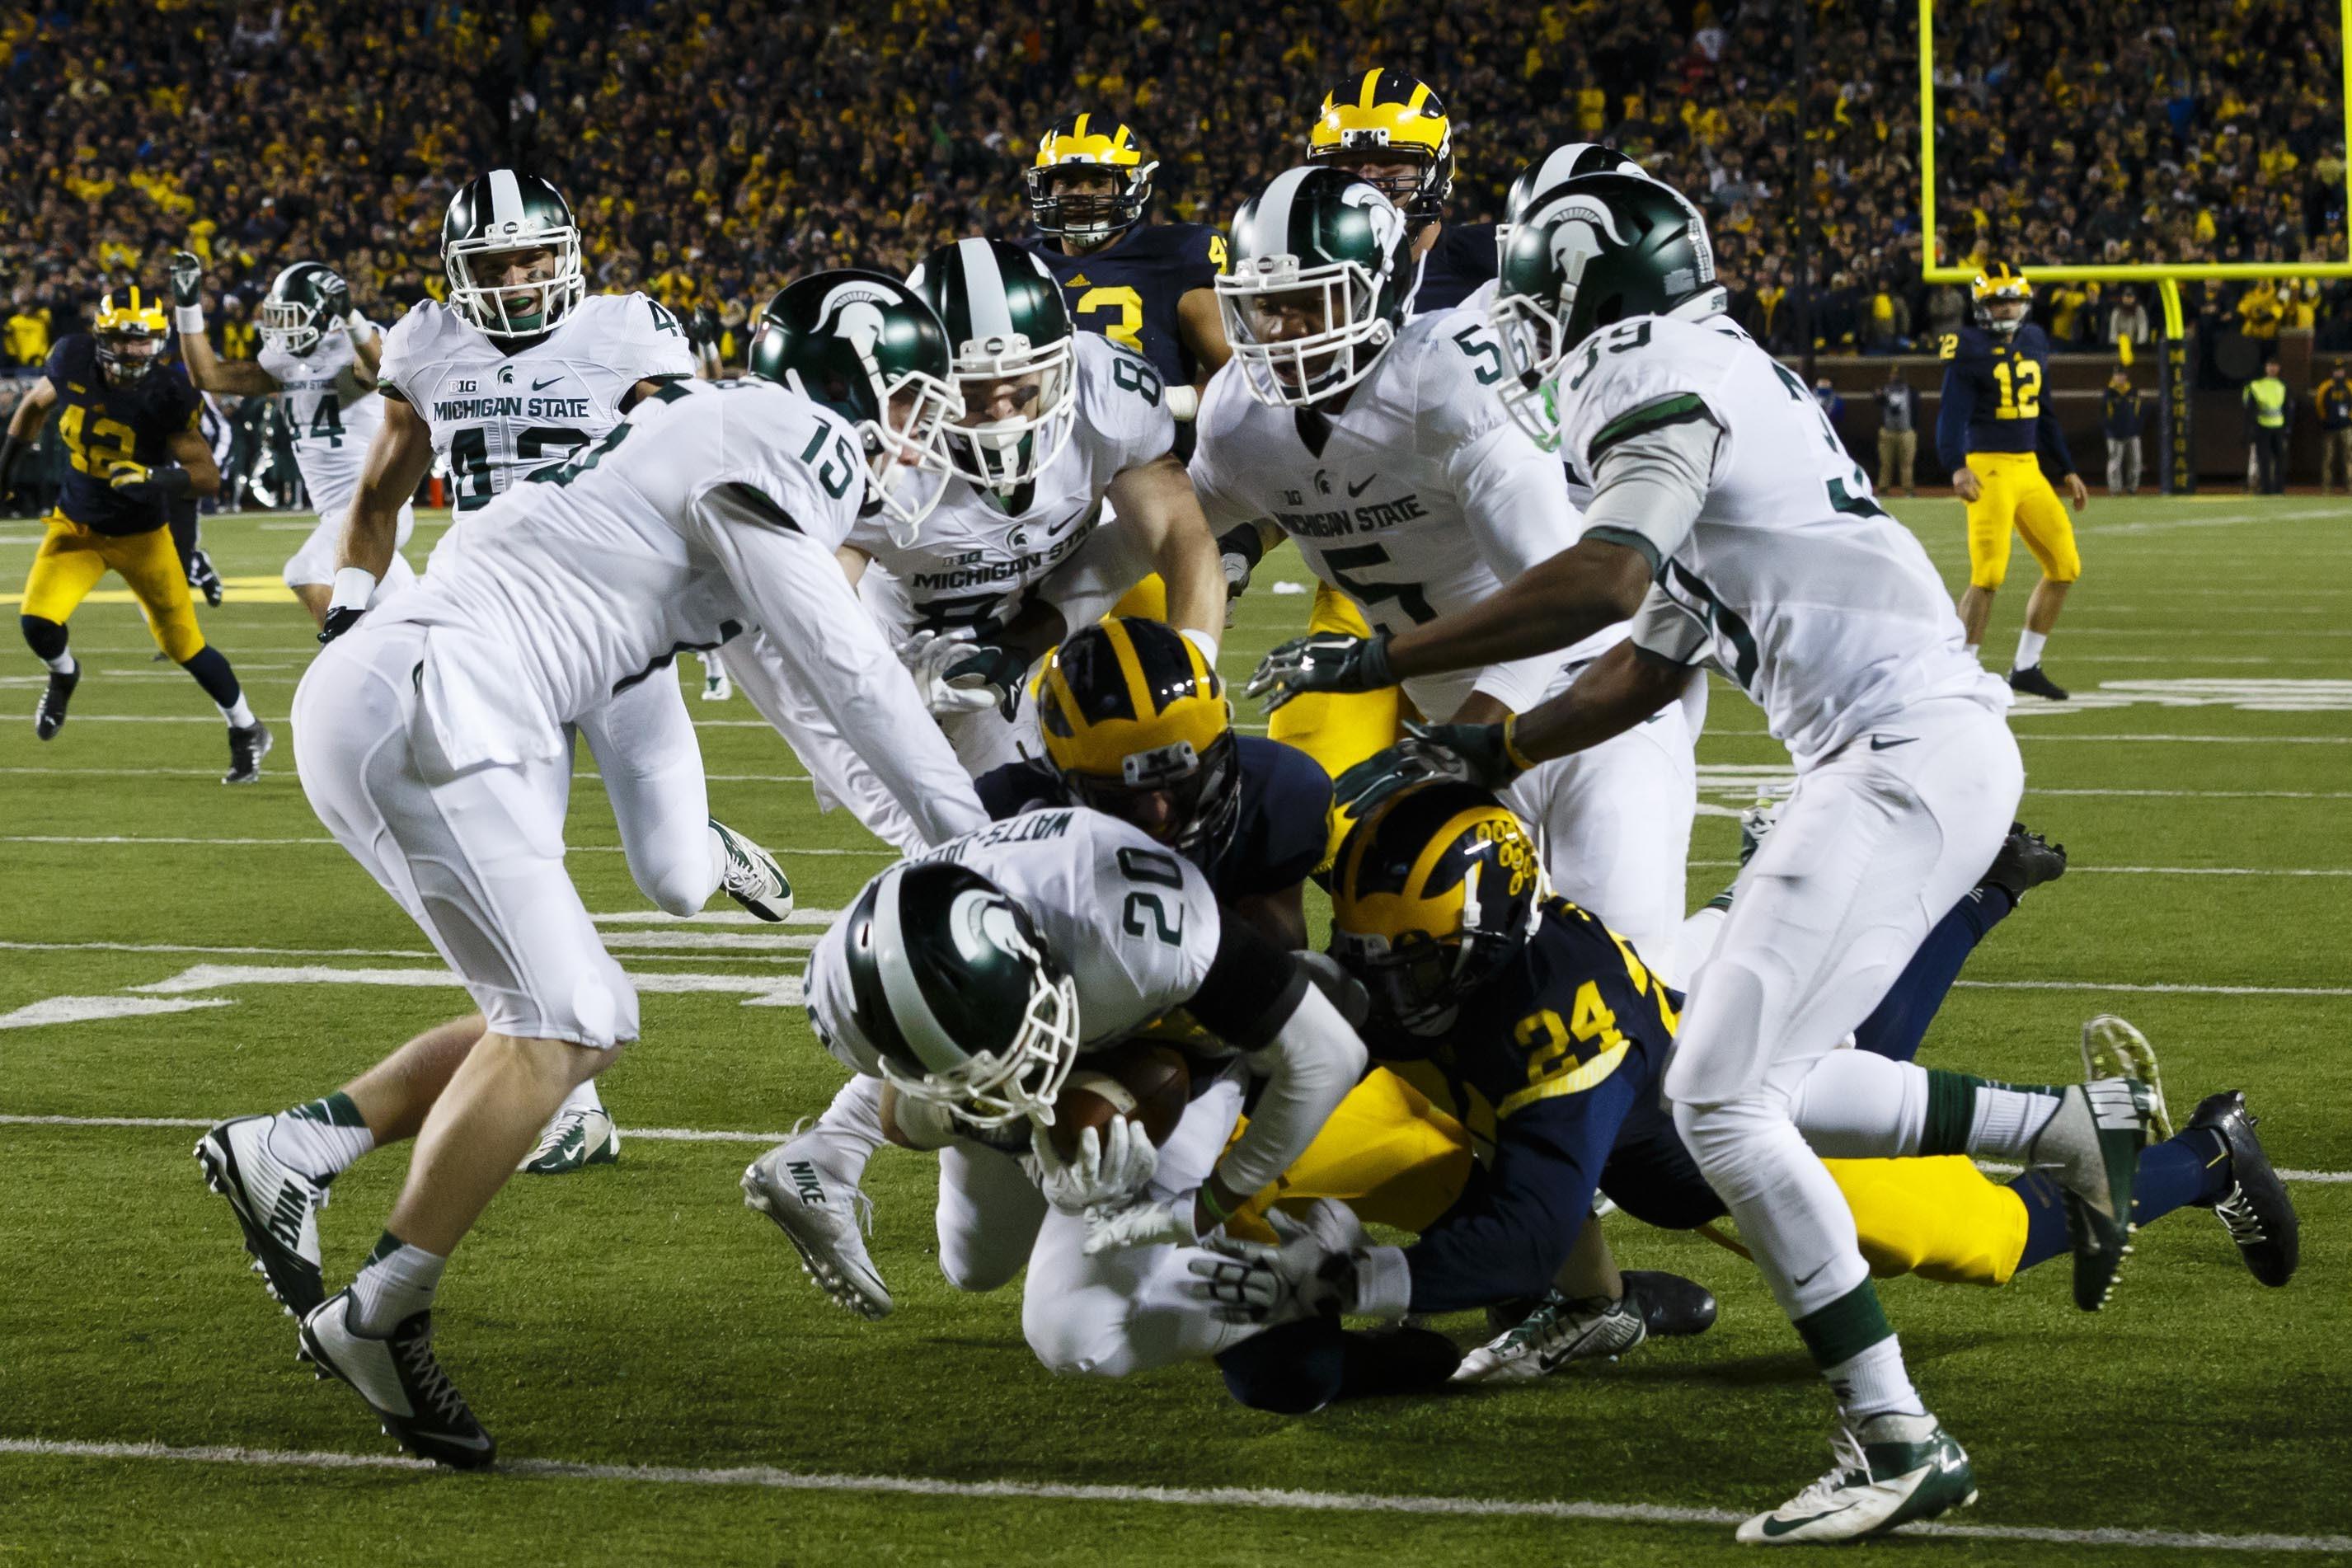 Michigan State Spartans Scoutcom · michigan state spartans football  wallpaper …